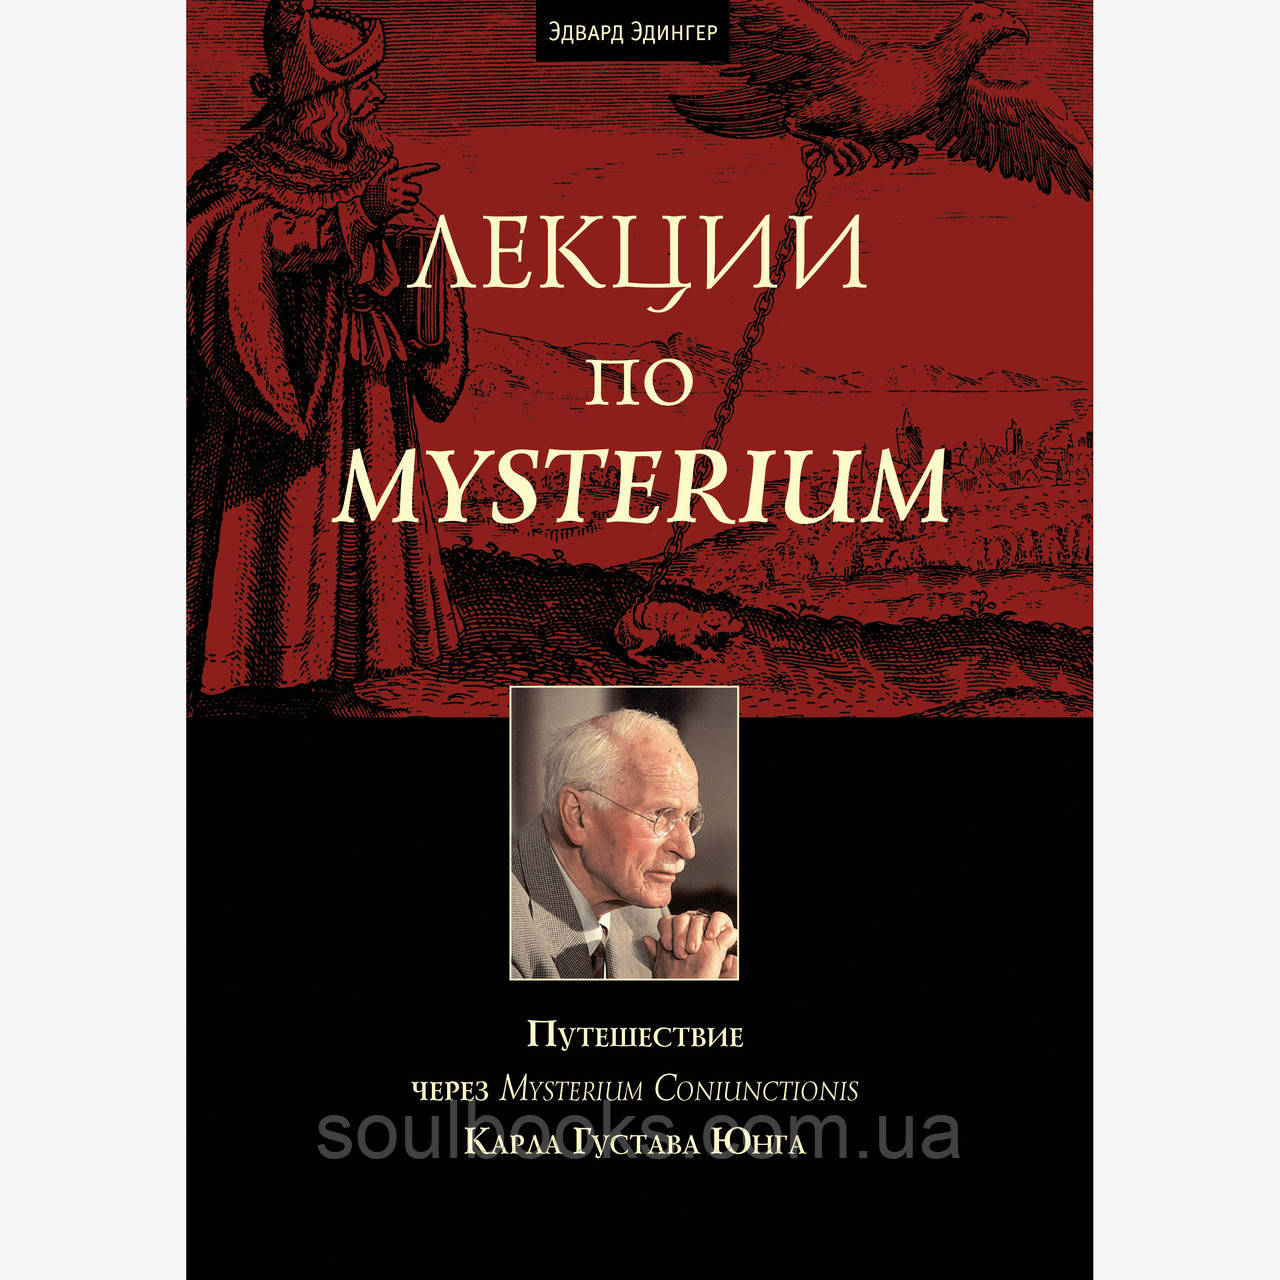 Лекції з Mysterium. Подорож через Mysterium Coniunctionis К. Р. Юнга. Едвард Едінгер